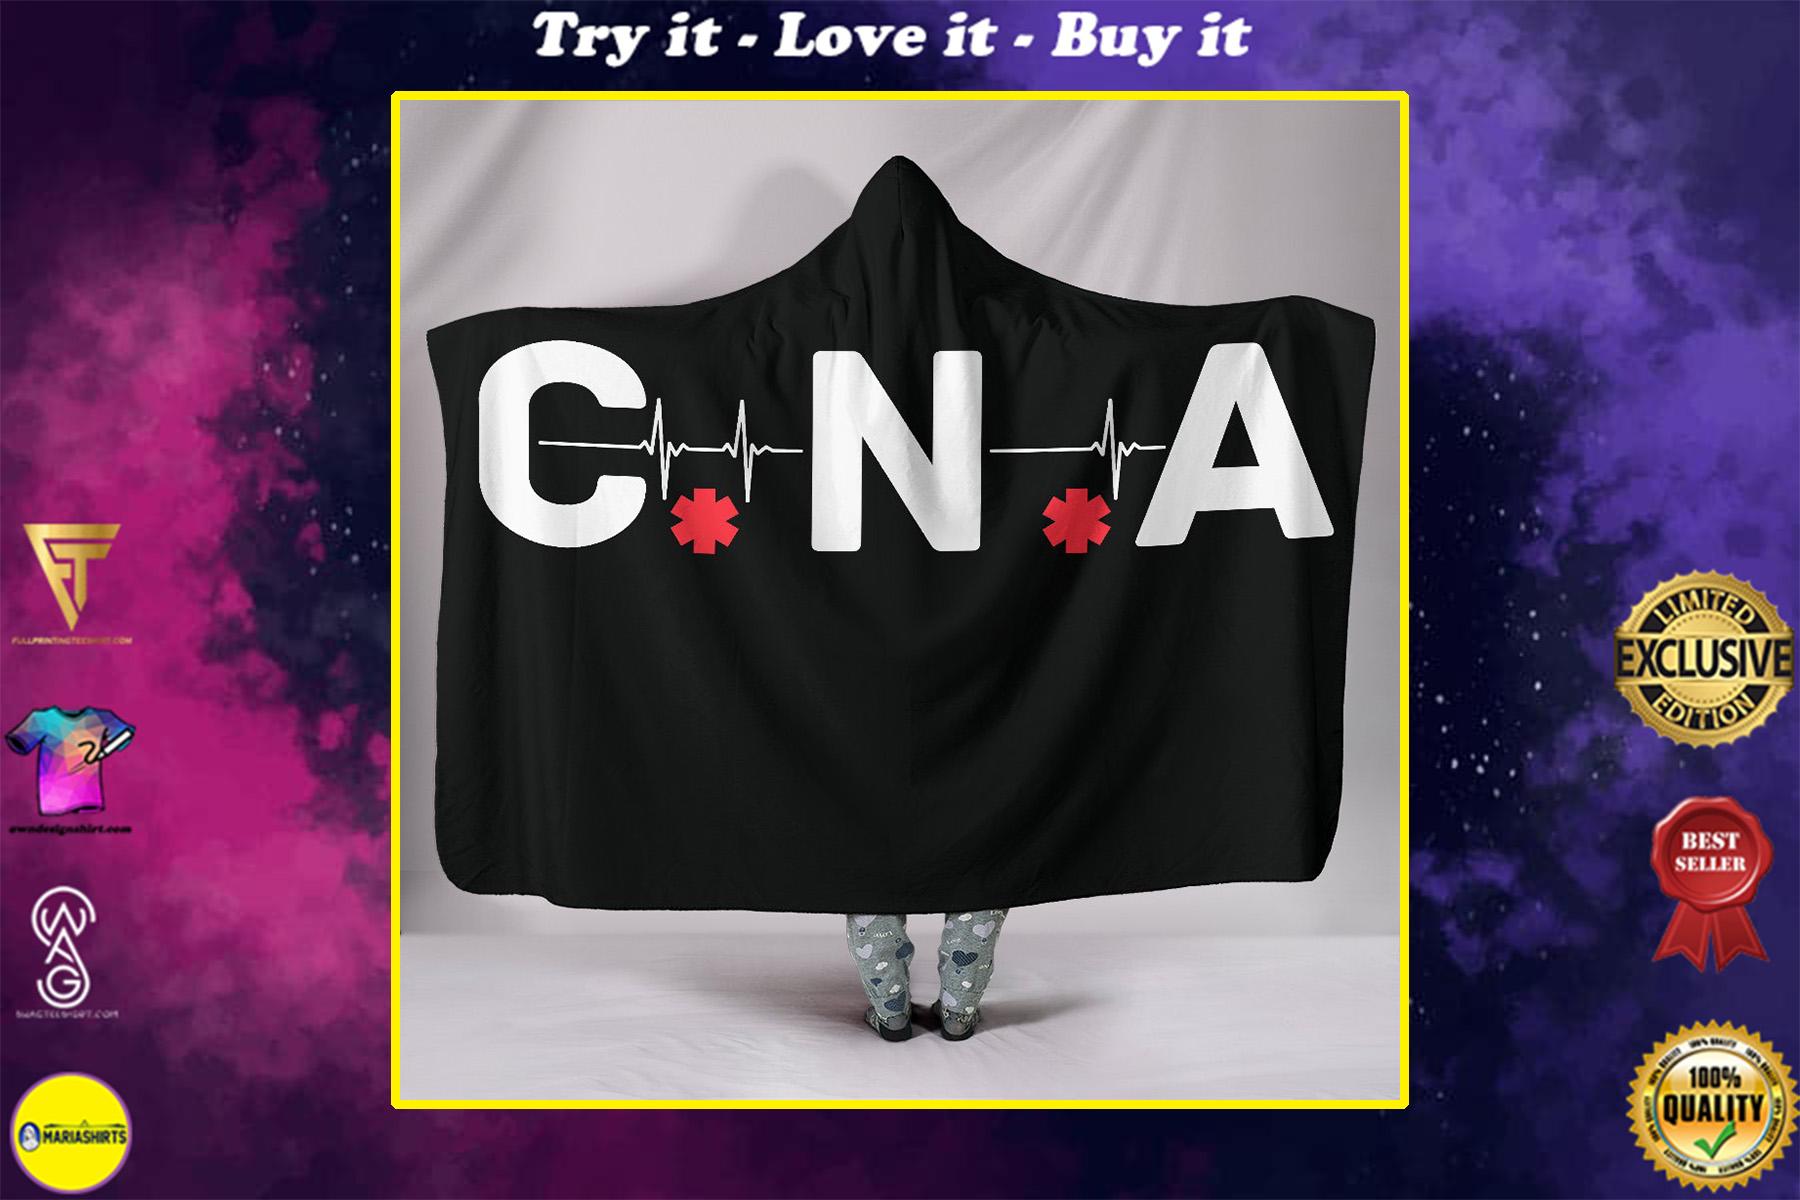 canadian nurses association full printing hooded blanket